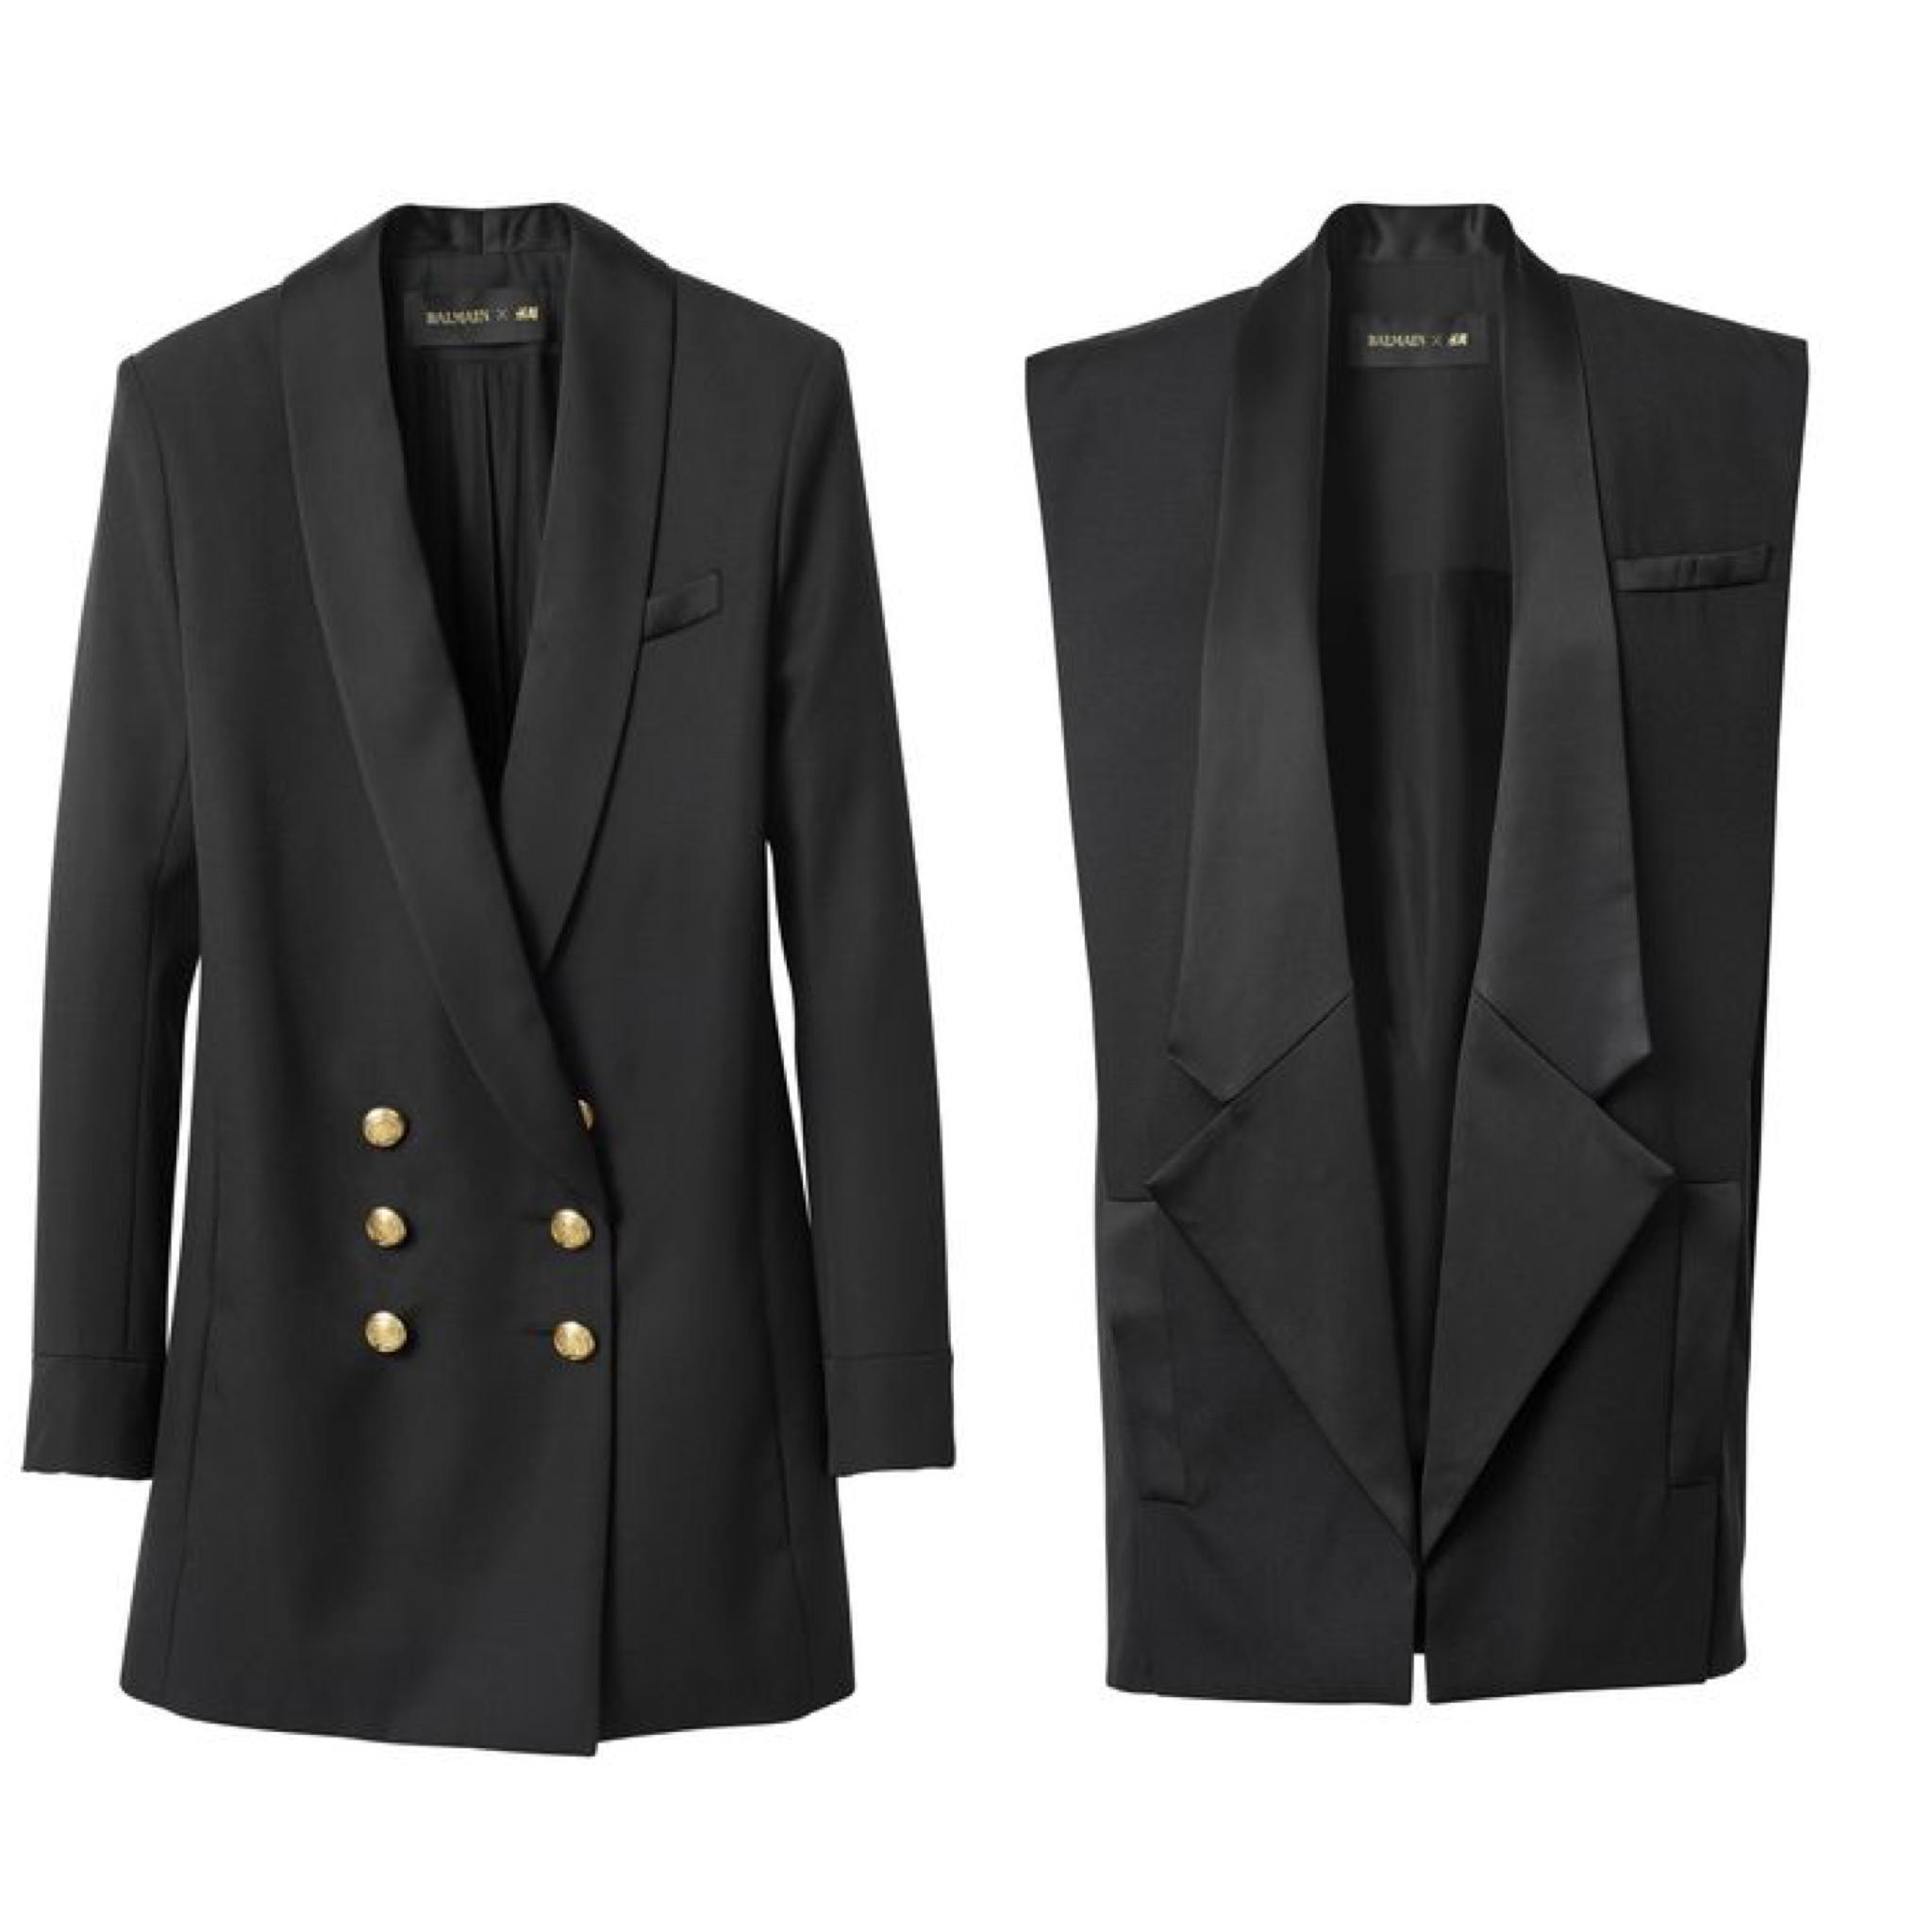 5c9d30c02 Balmain H&M blazer sleeveless vest